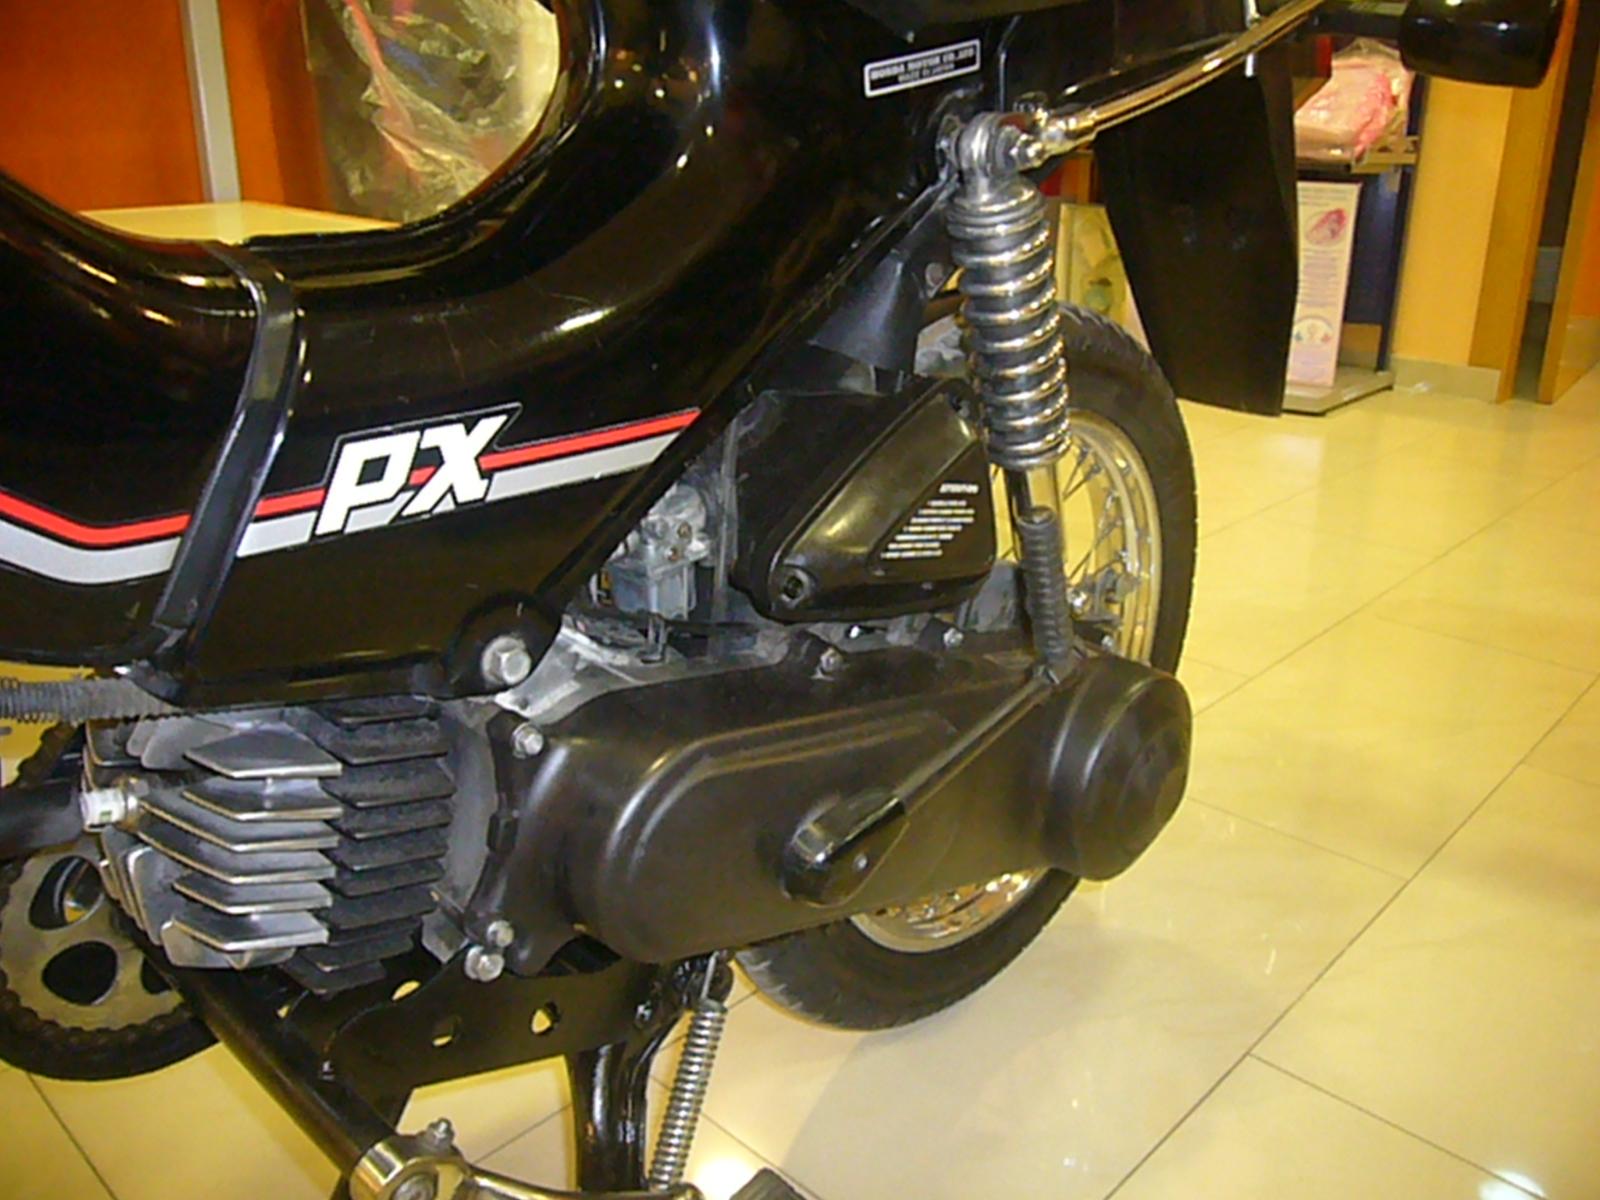 HONDA -  Mi Honda PX '84 - Página 2 1b6e52ee6ed5d835dfe45cbd08b61eeco